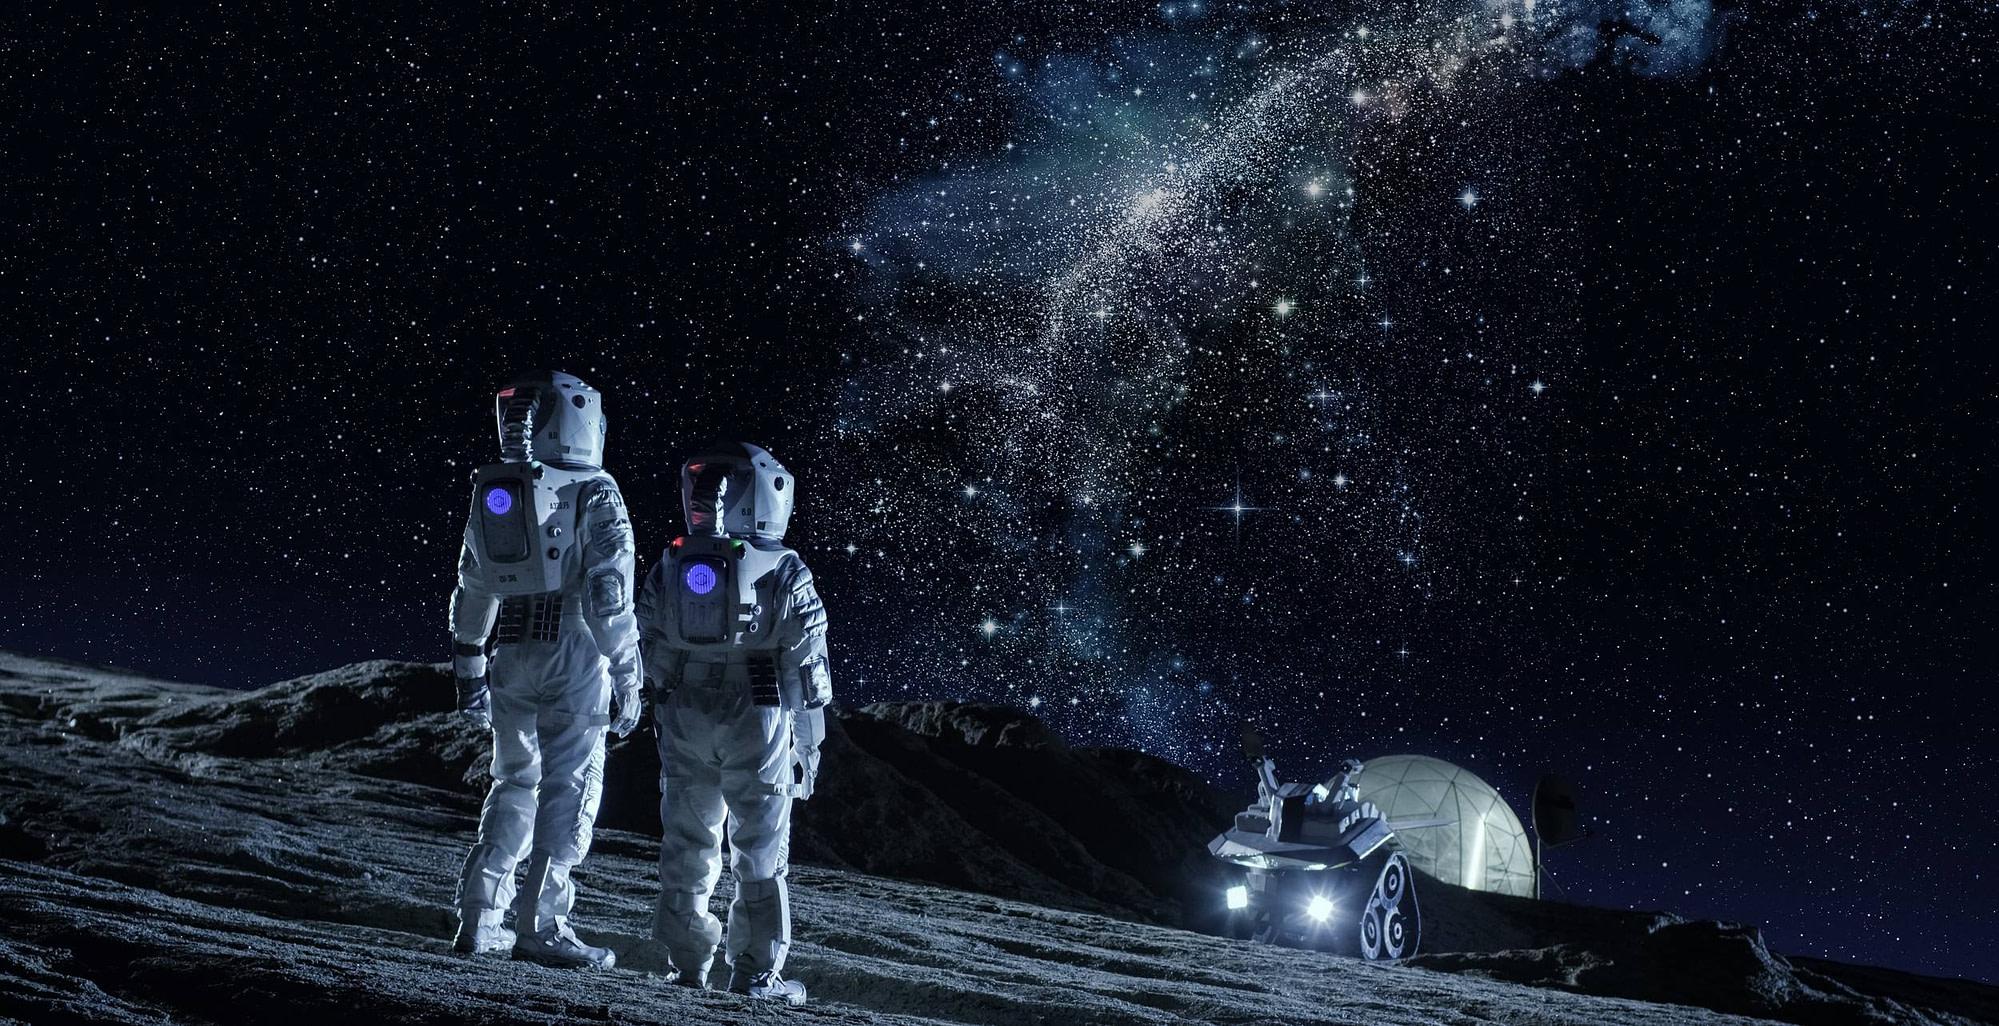 Squad astronauts